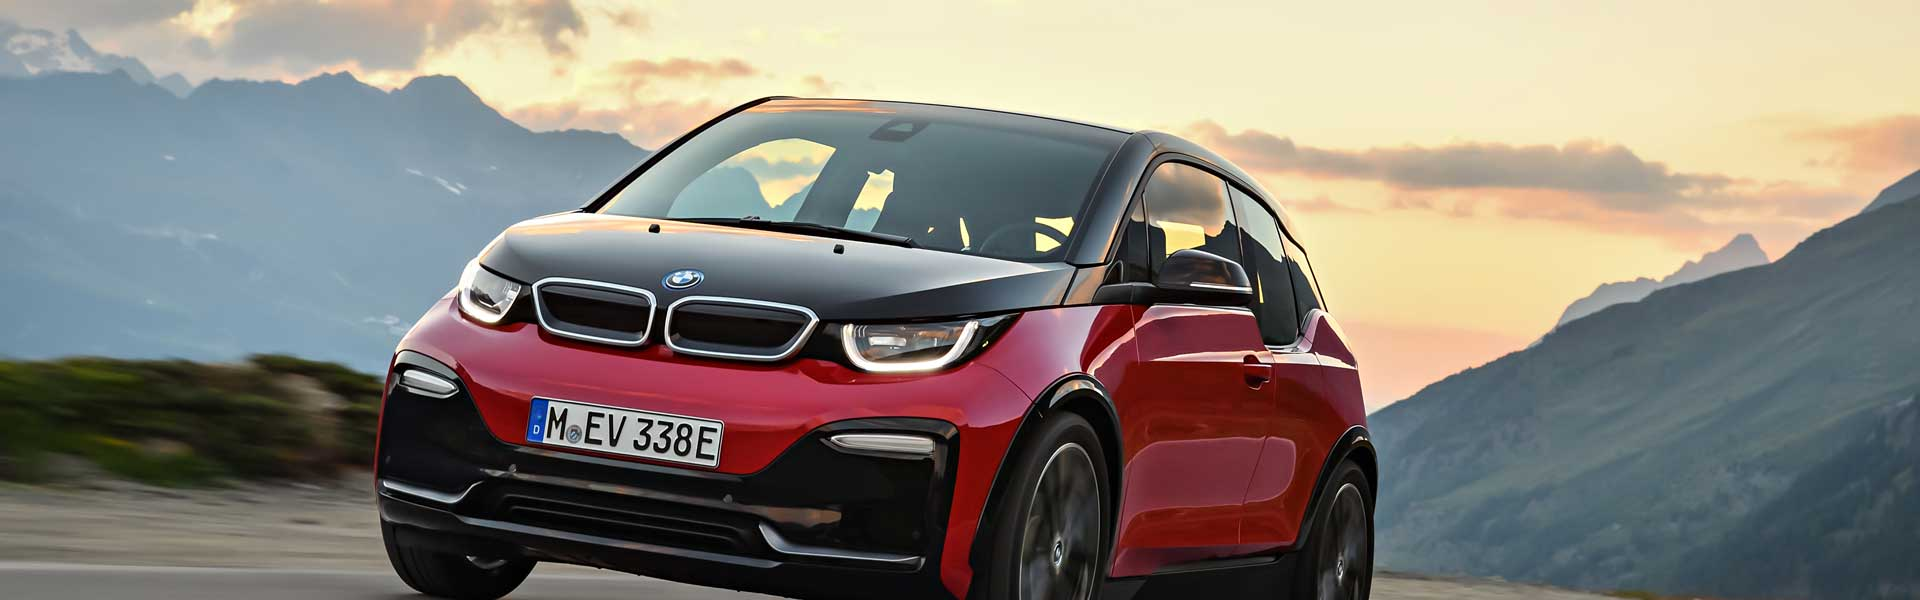 Neuer BMW i3 S im Elektromobilitätszentrum Freiburg